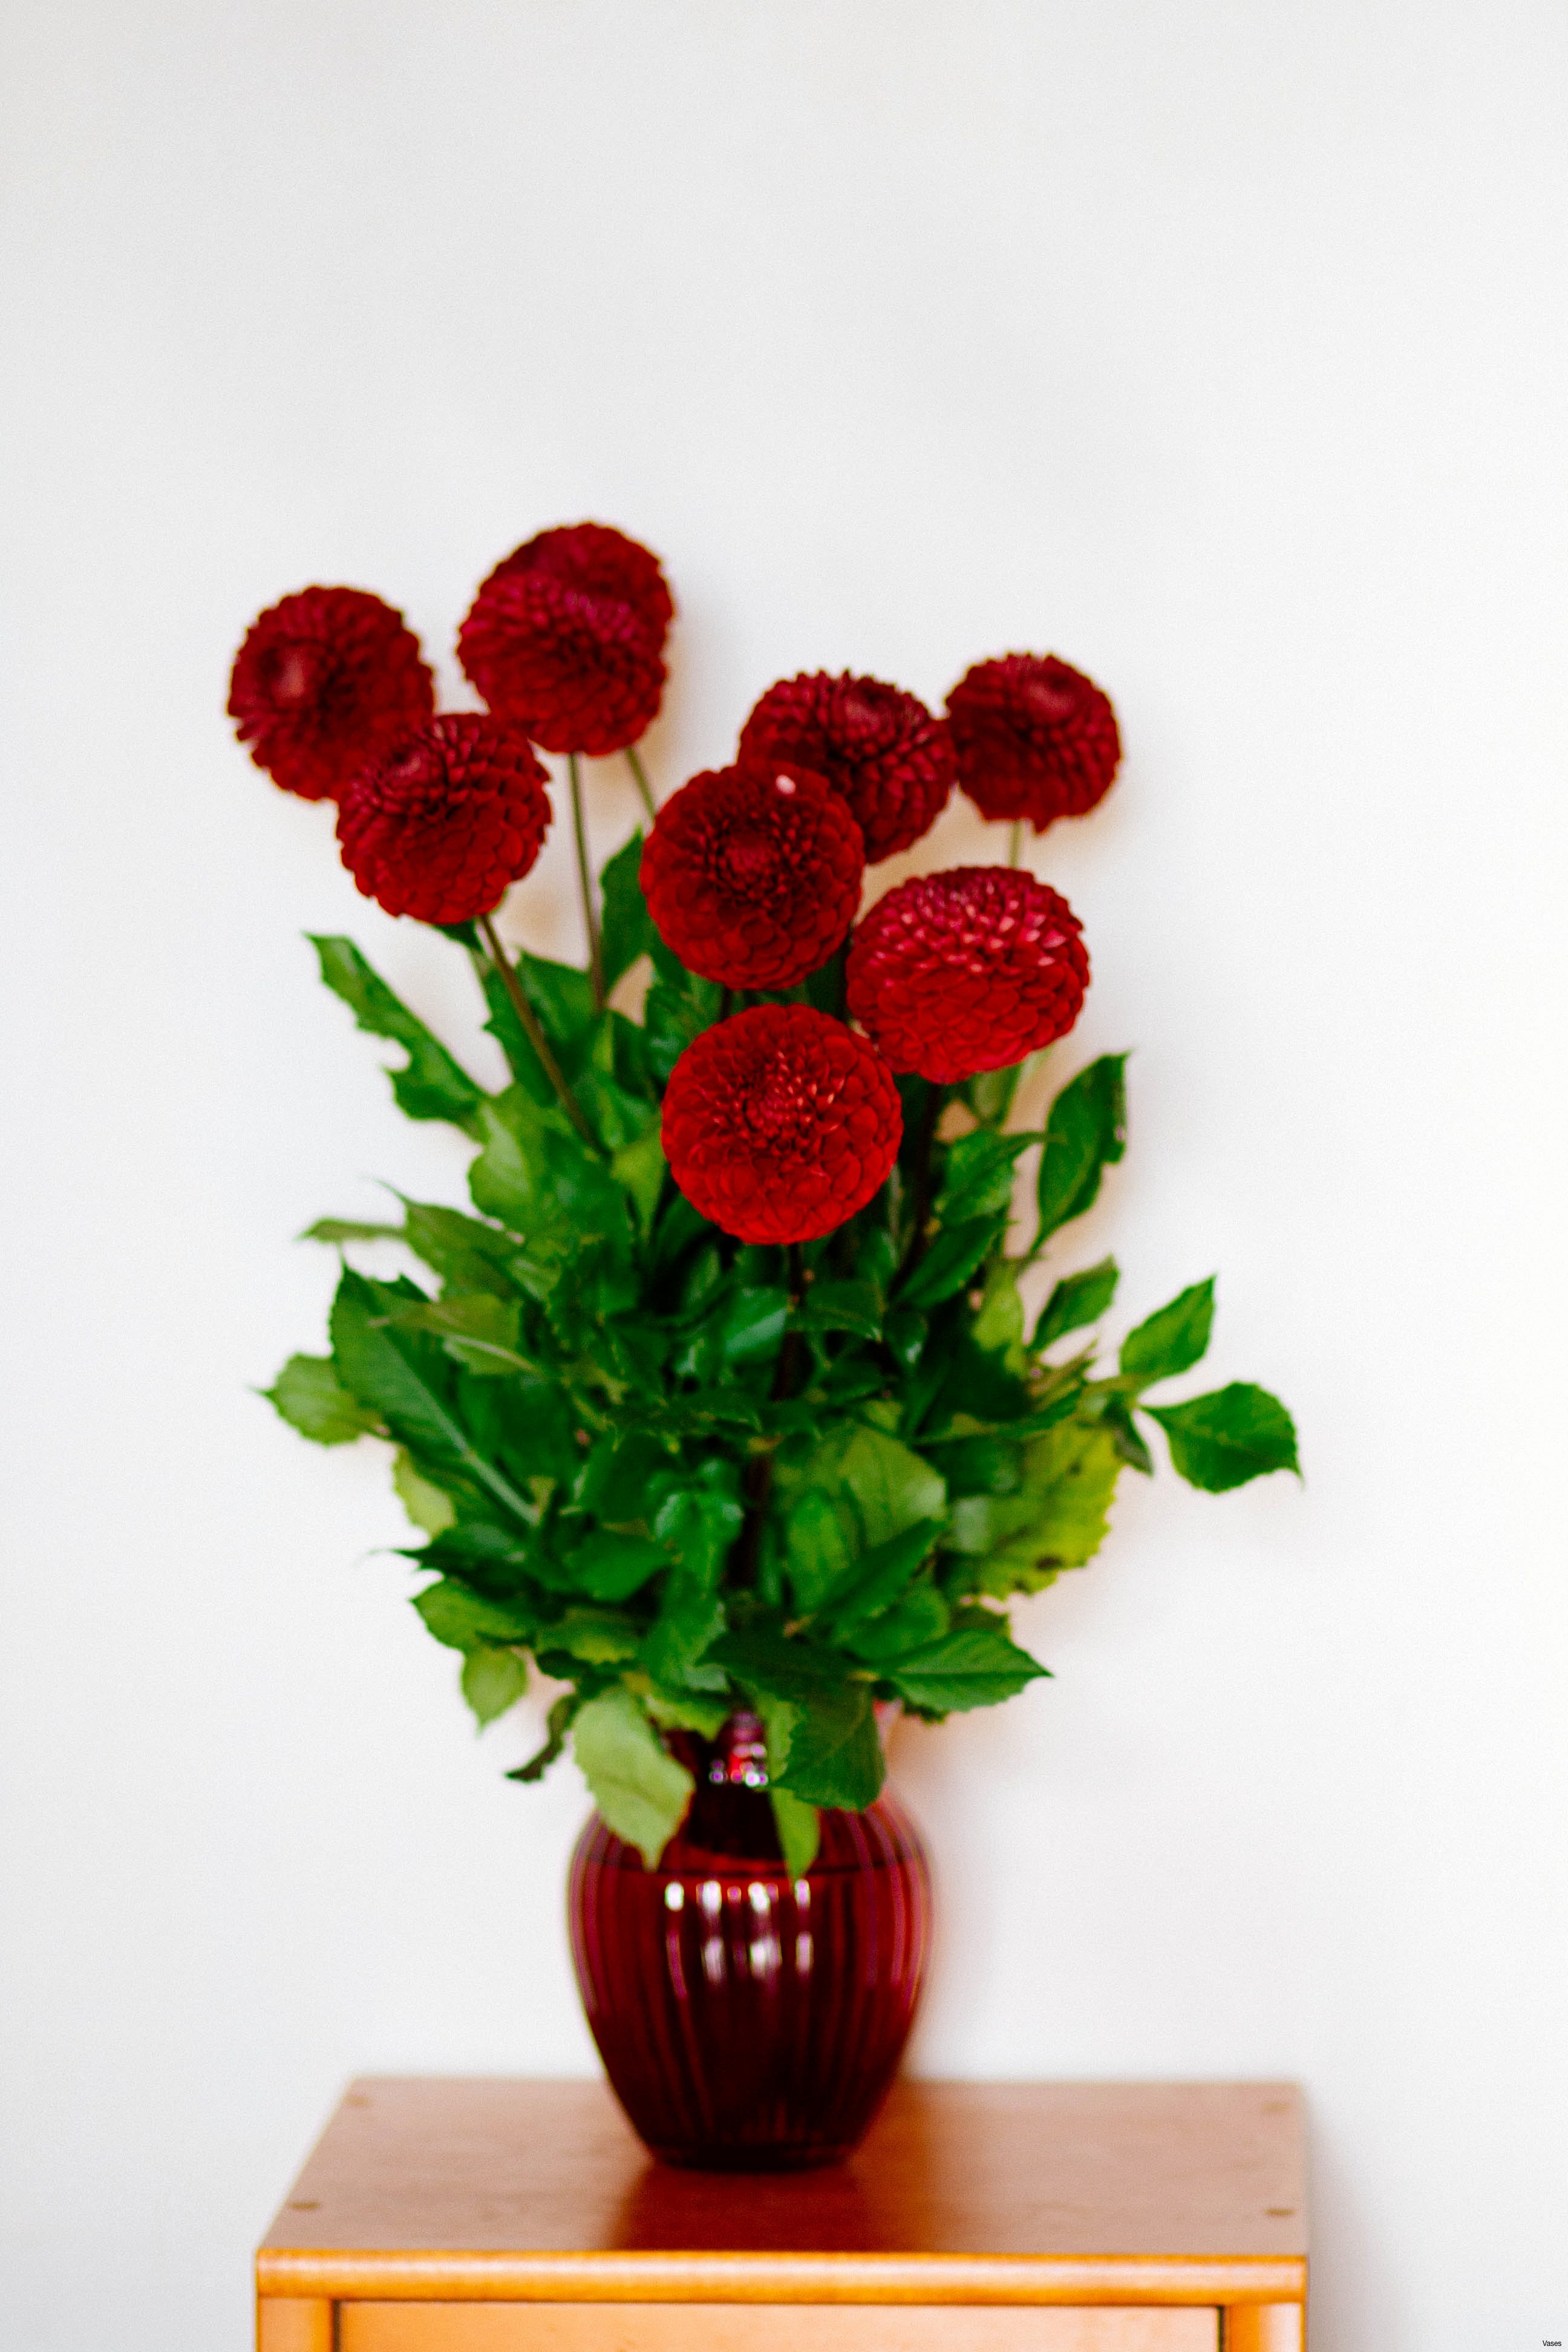 large floor vase nz of flower image pic awesome vases floor vase flowers with flowersi 0d with flower image pic colorful 10 unique wallpaper flowers pics flower image pic awesome tall vase centerpiece